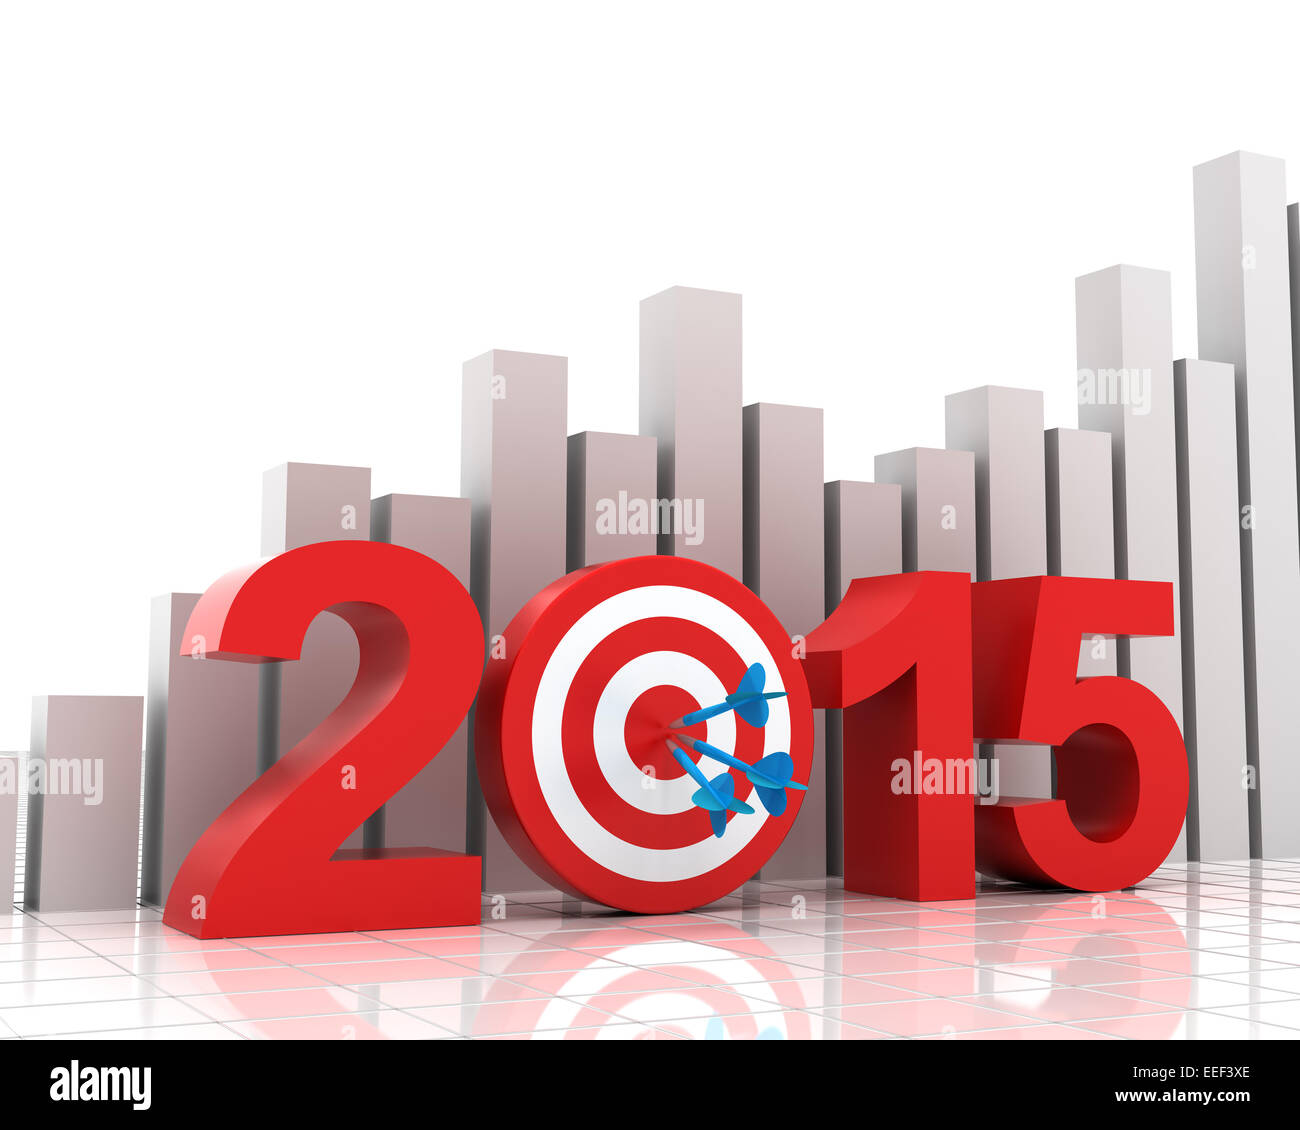 Objetivo de 2015 Antecedentes con gráfico de barras Imagen De Stock